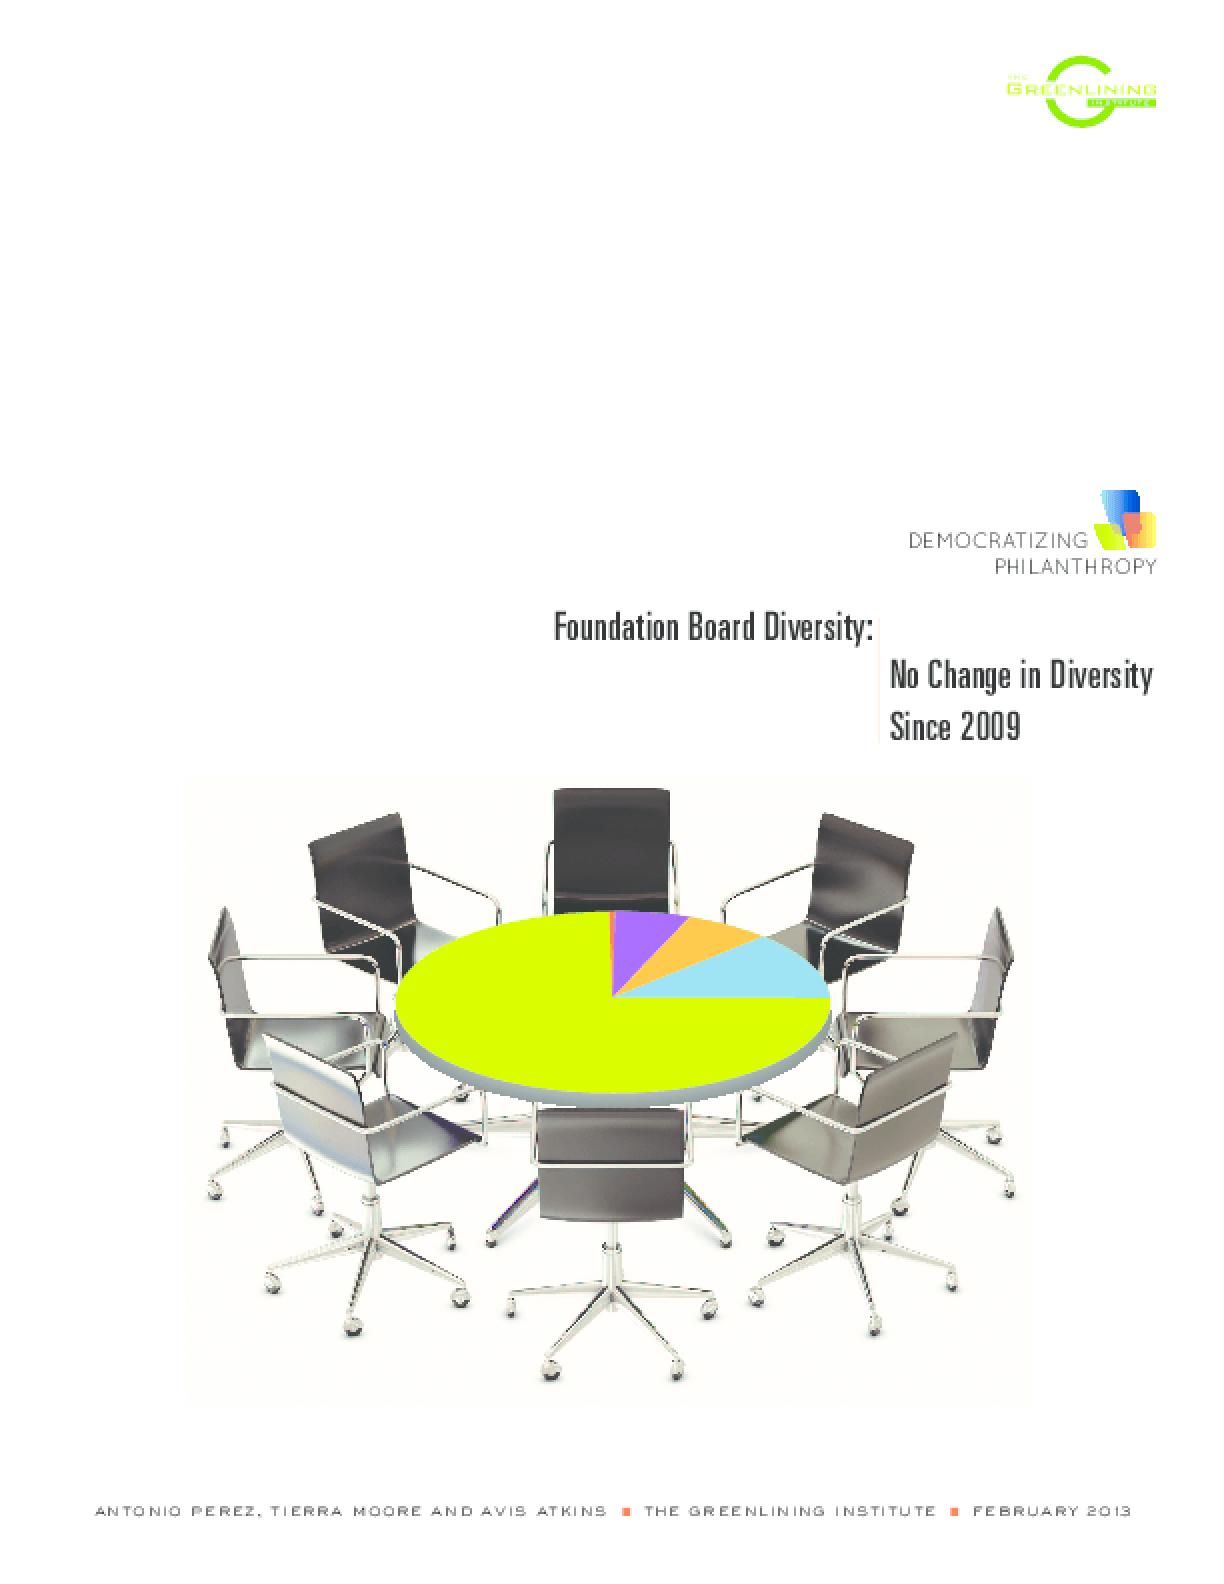 Foundation Board Diversity: No Change in Diversity Since 2009